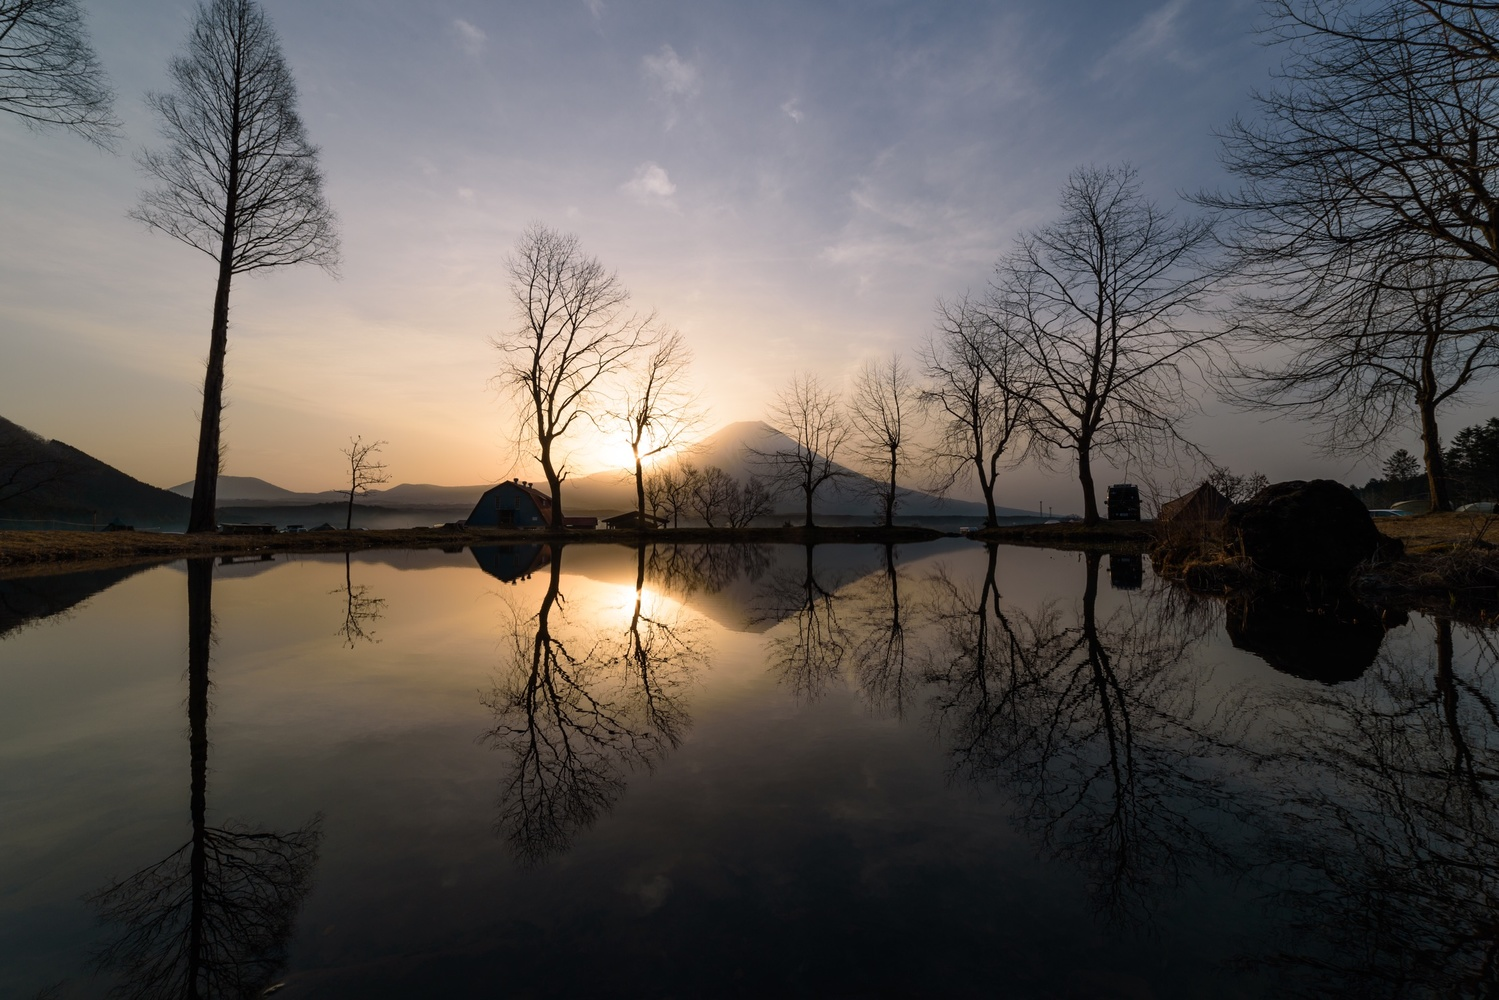 Shinning morning by Masataka Inada